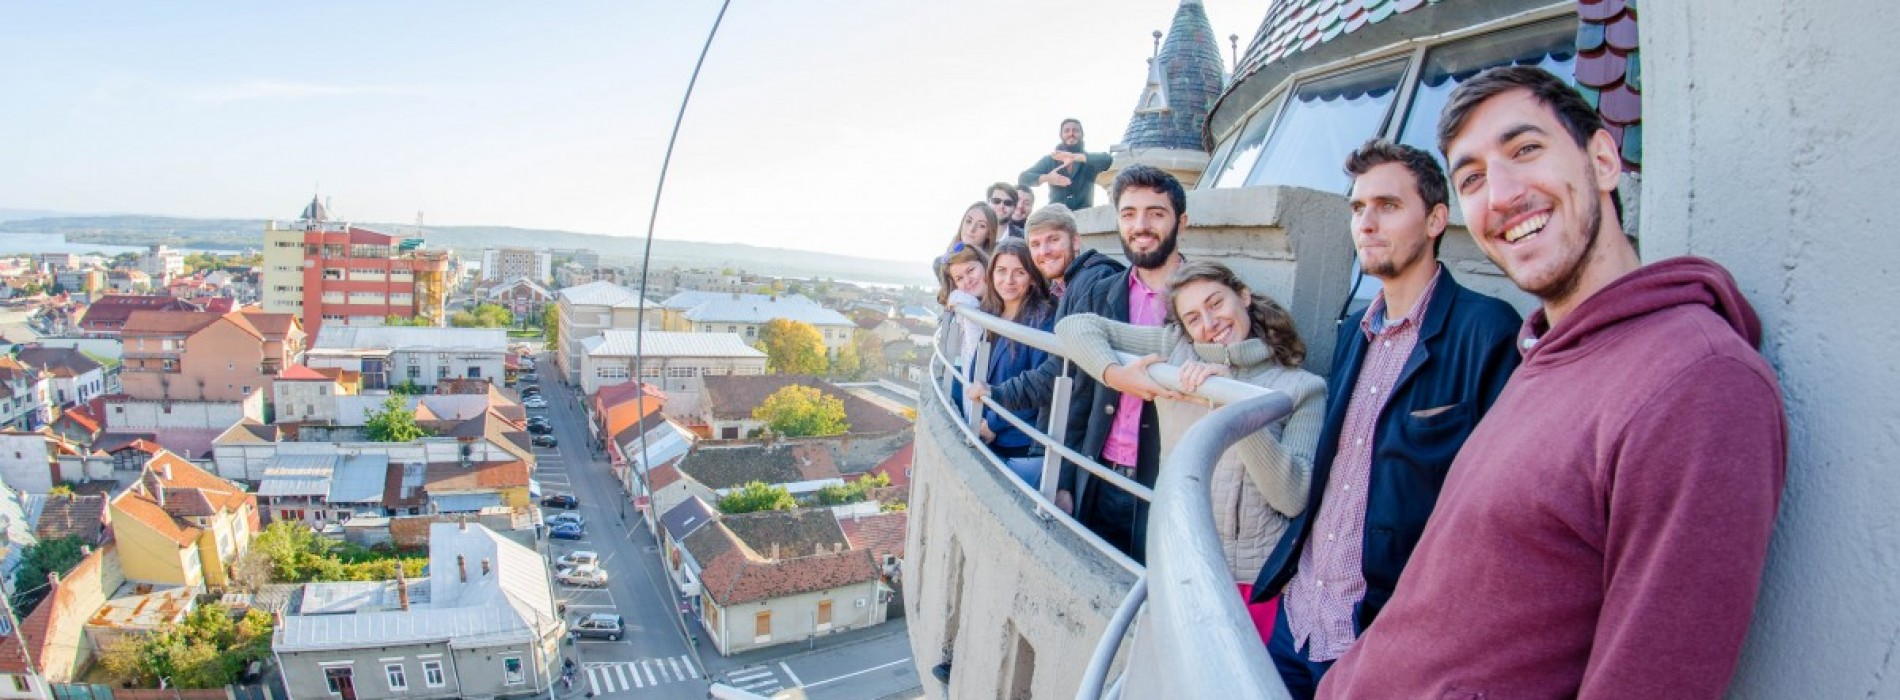 Zig Zag prin România. 10 tineri au luat țara la pas pentru 5 ani